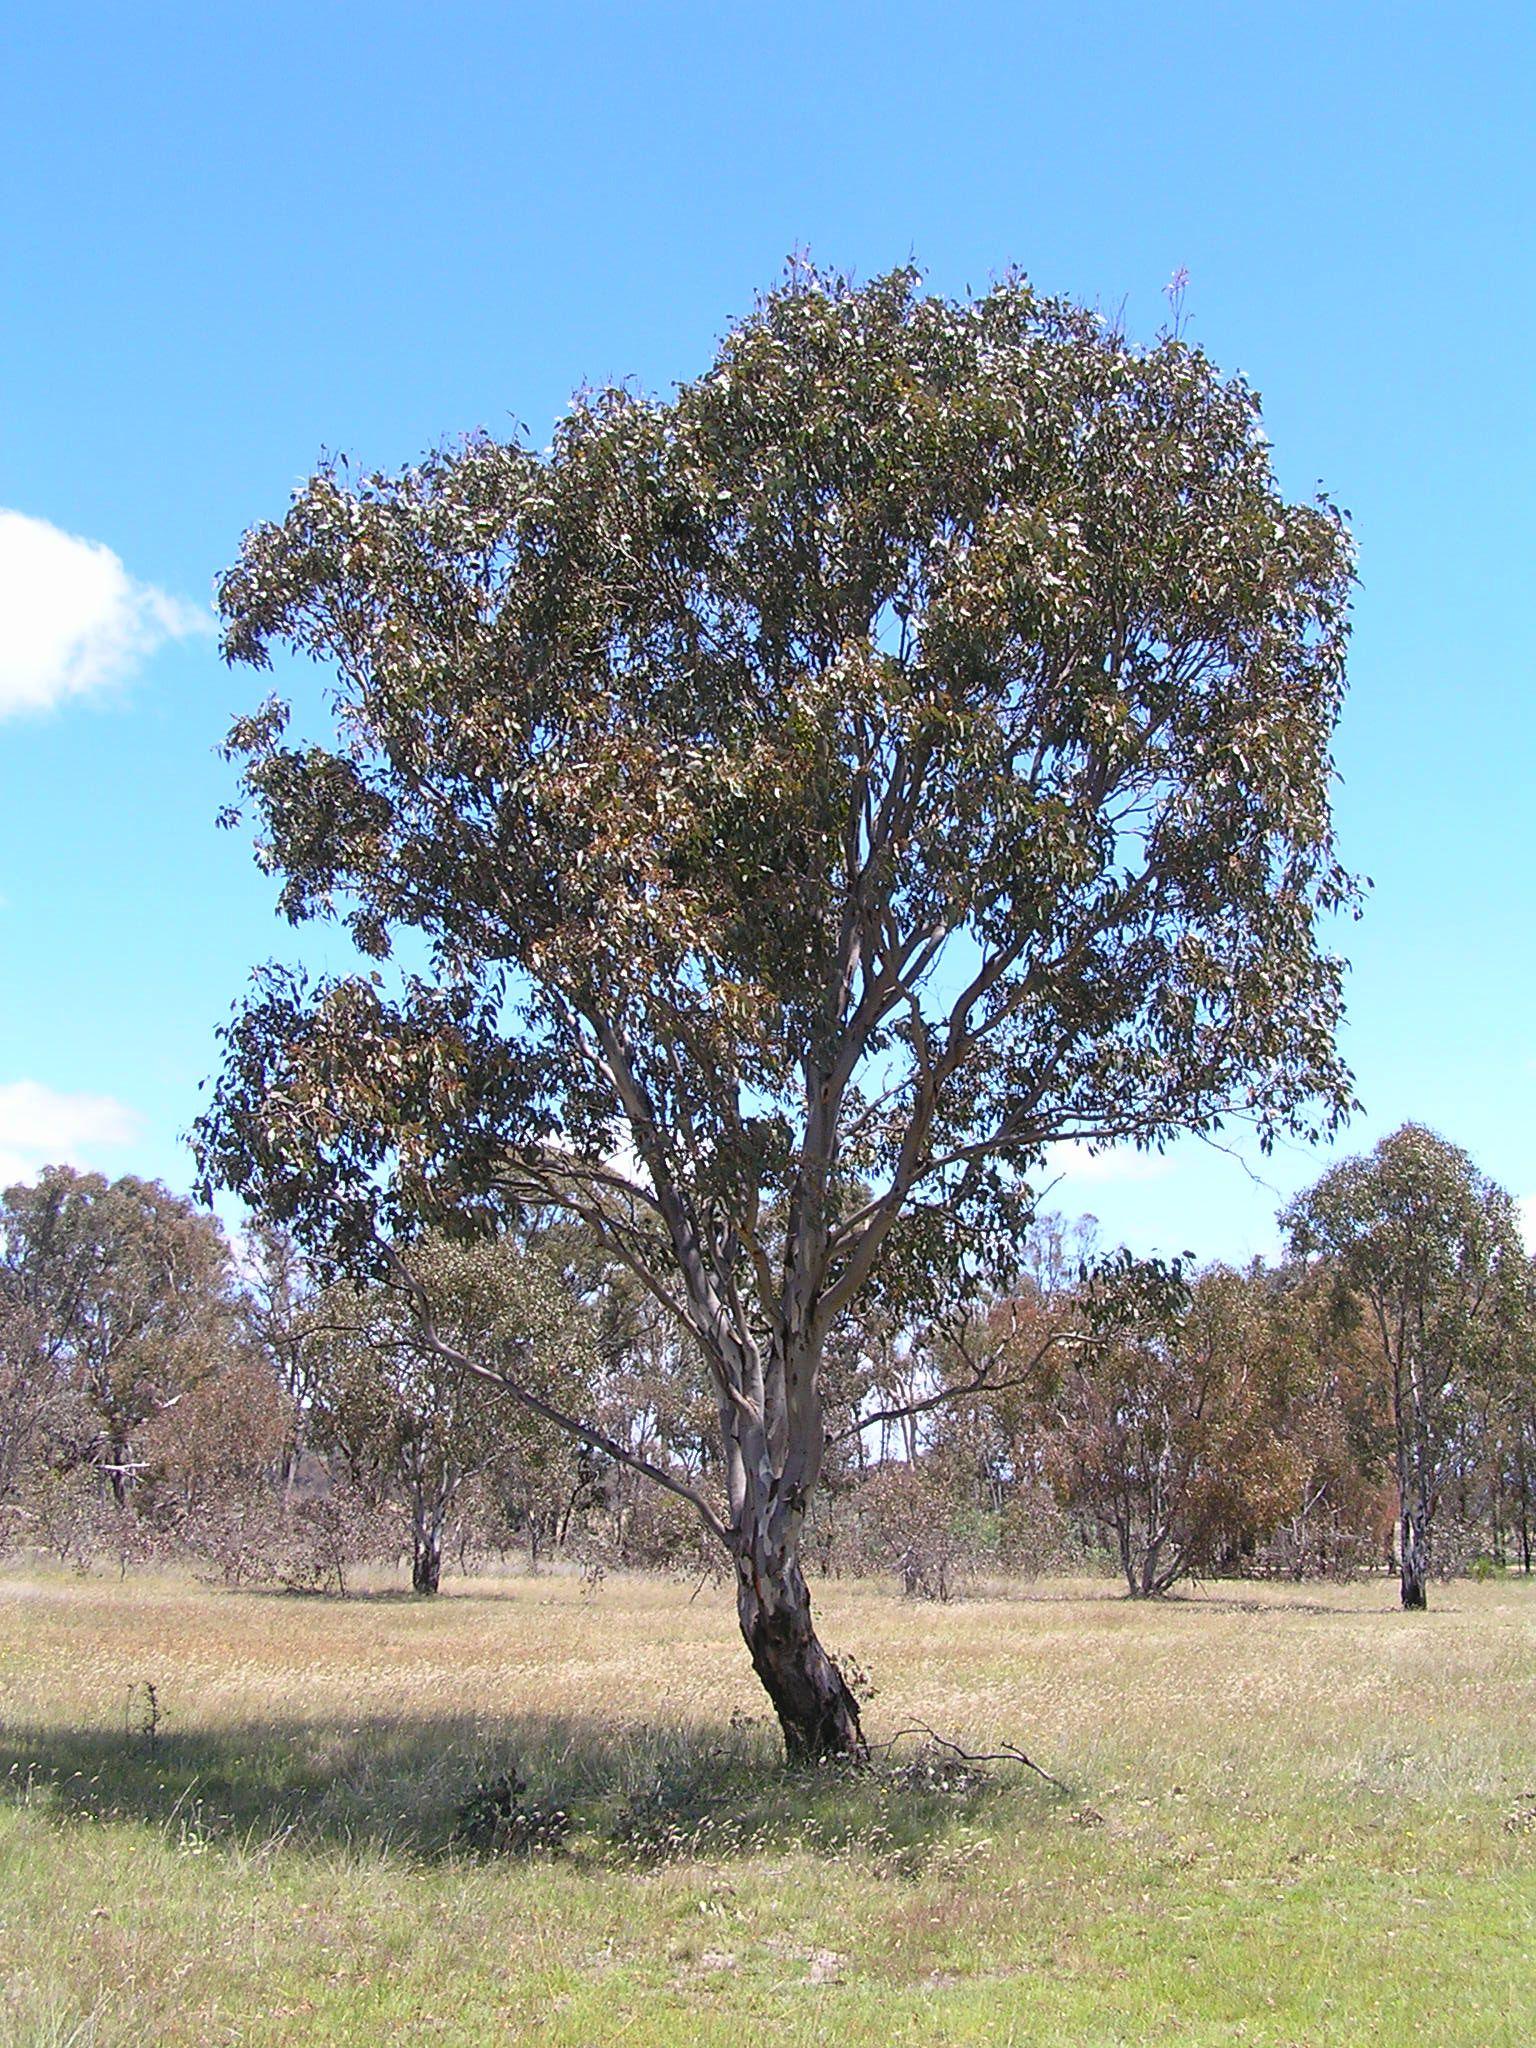 Blakelys Red Gum Eucalyptus Blakelyi A Common Eucalyptus Tree Of